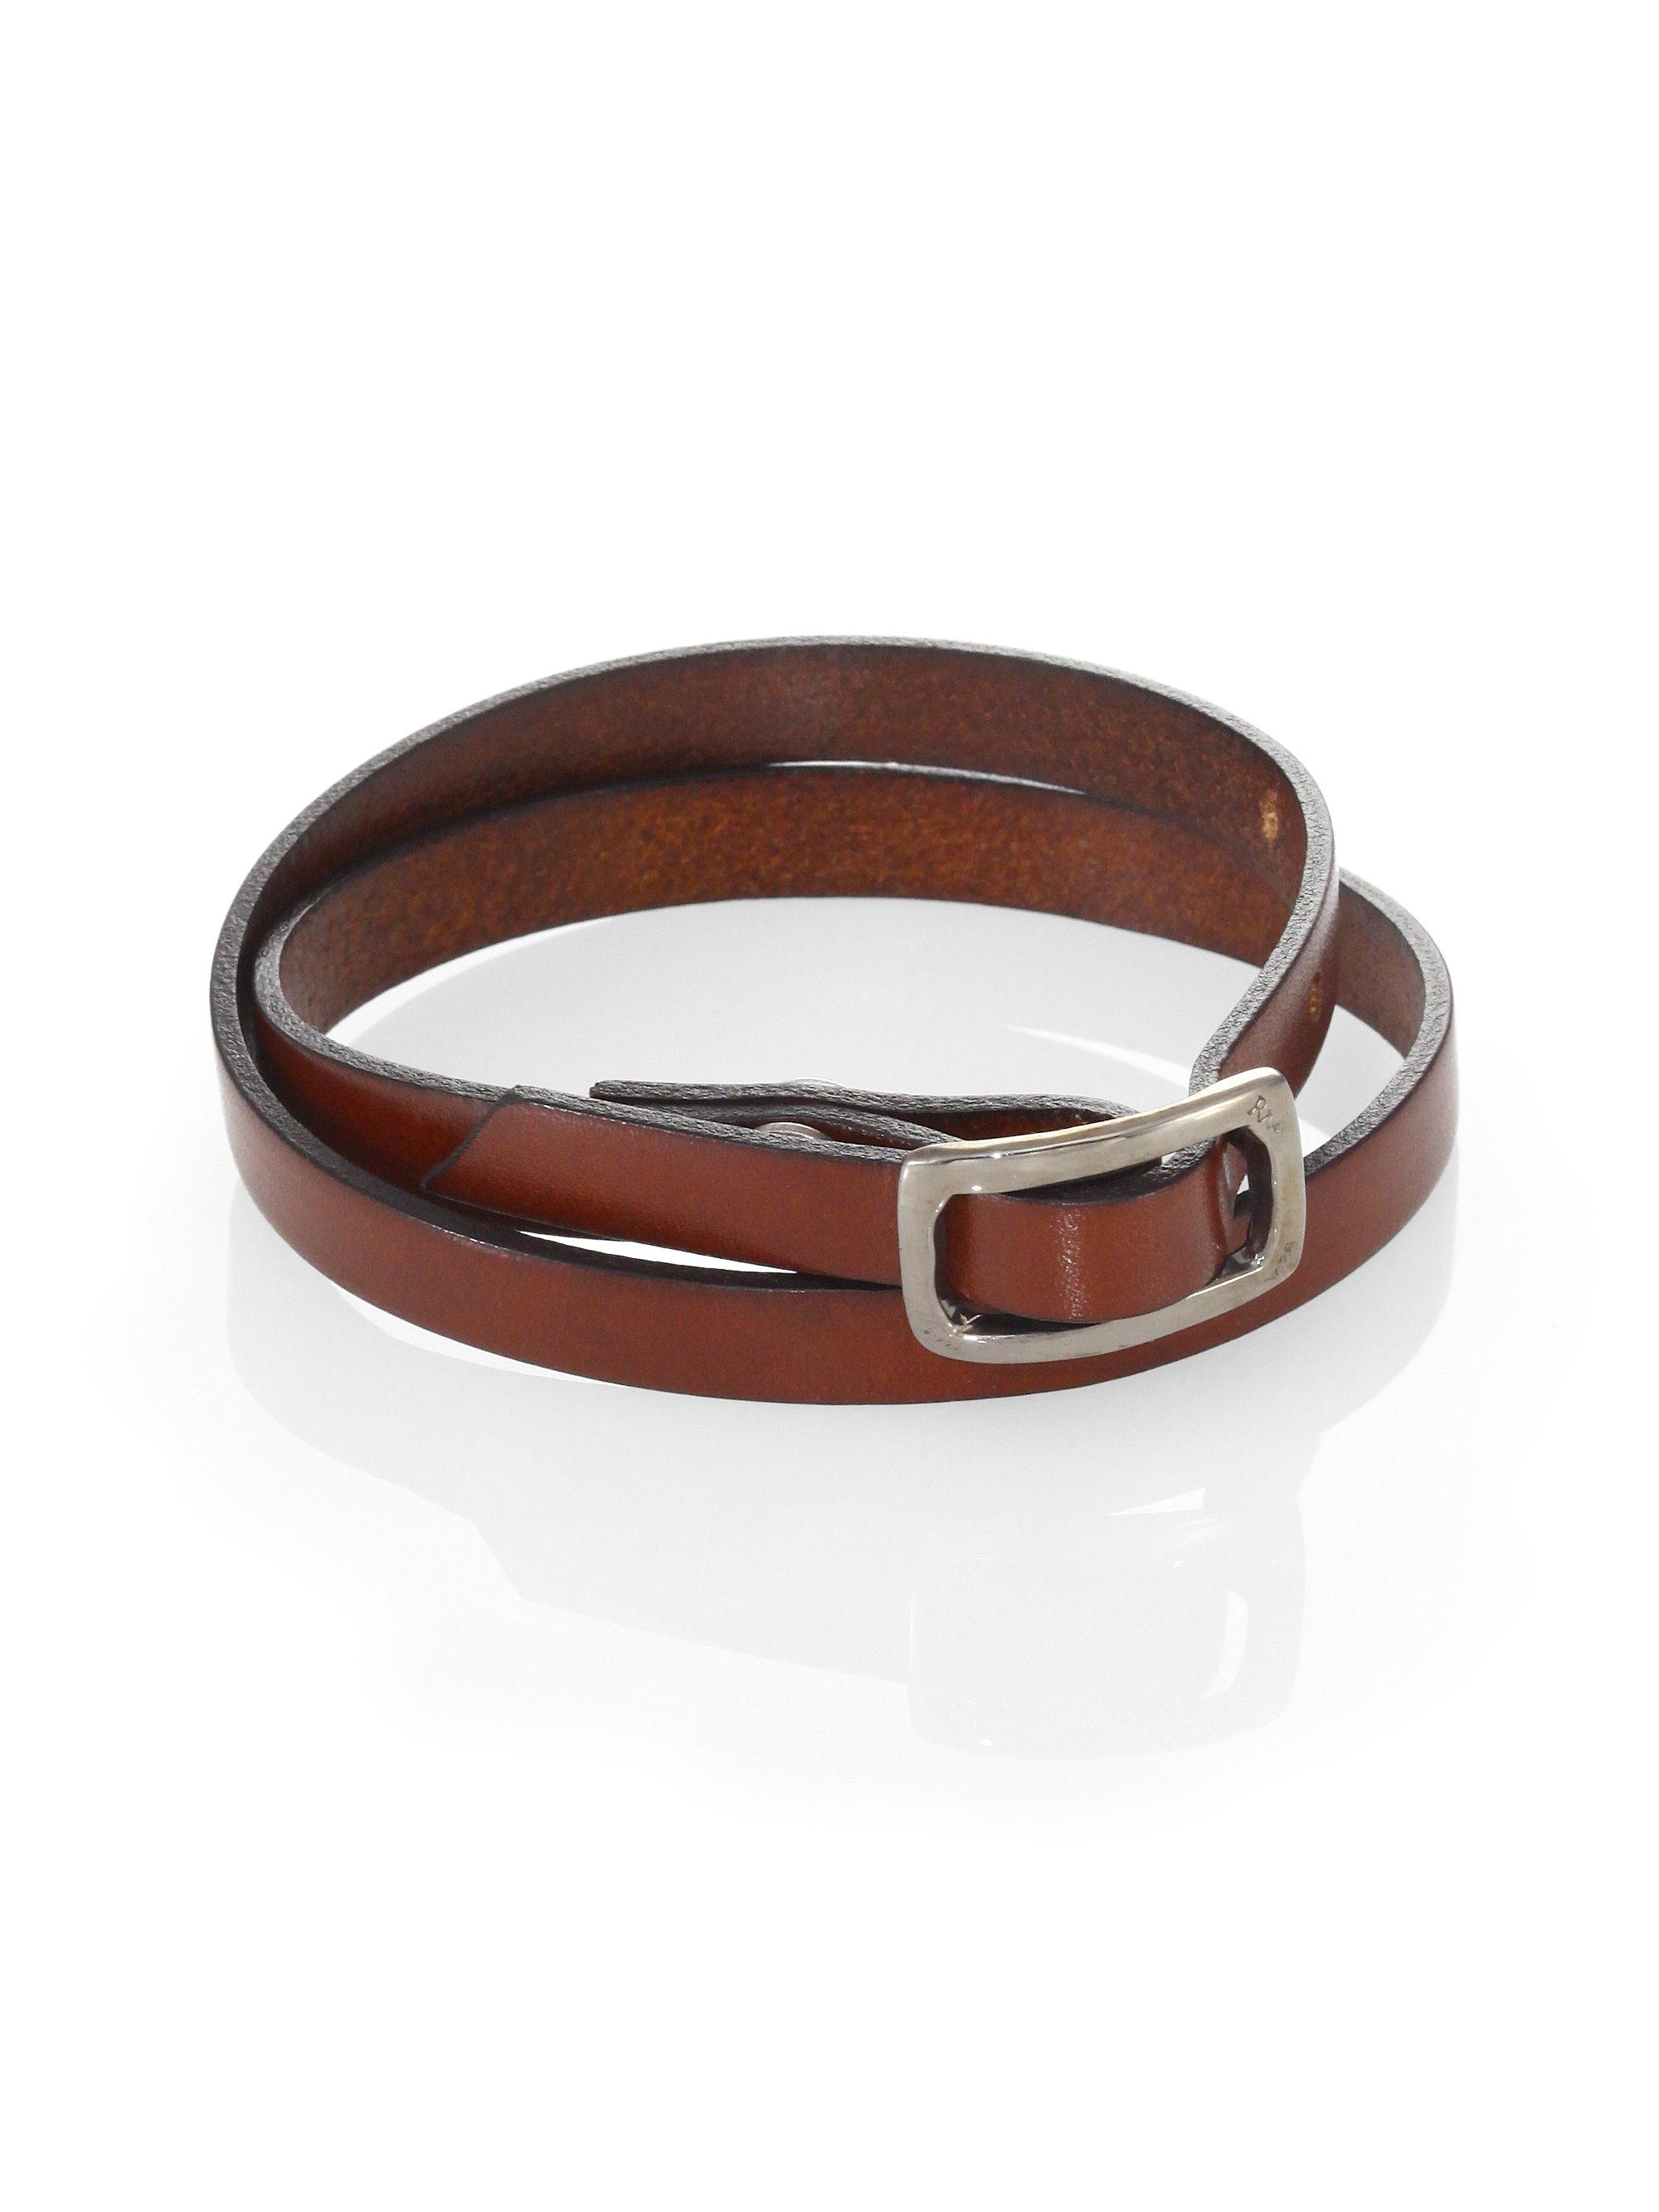 robin rotenier seville leather wrap bracelet in brown for